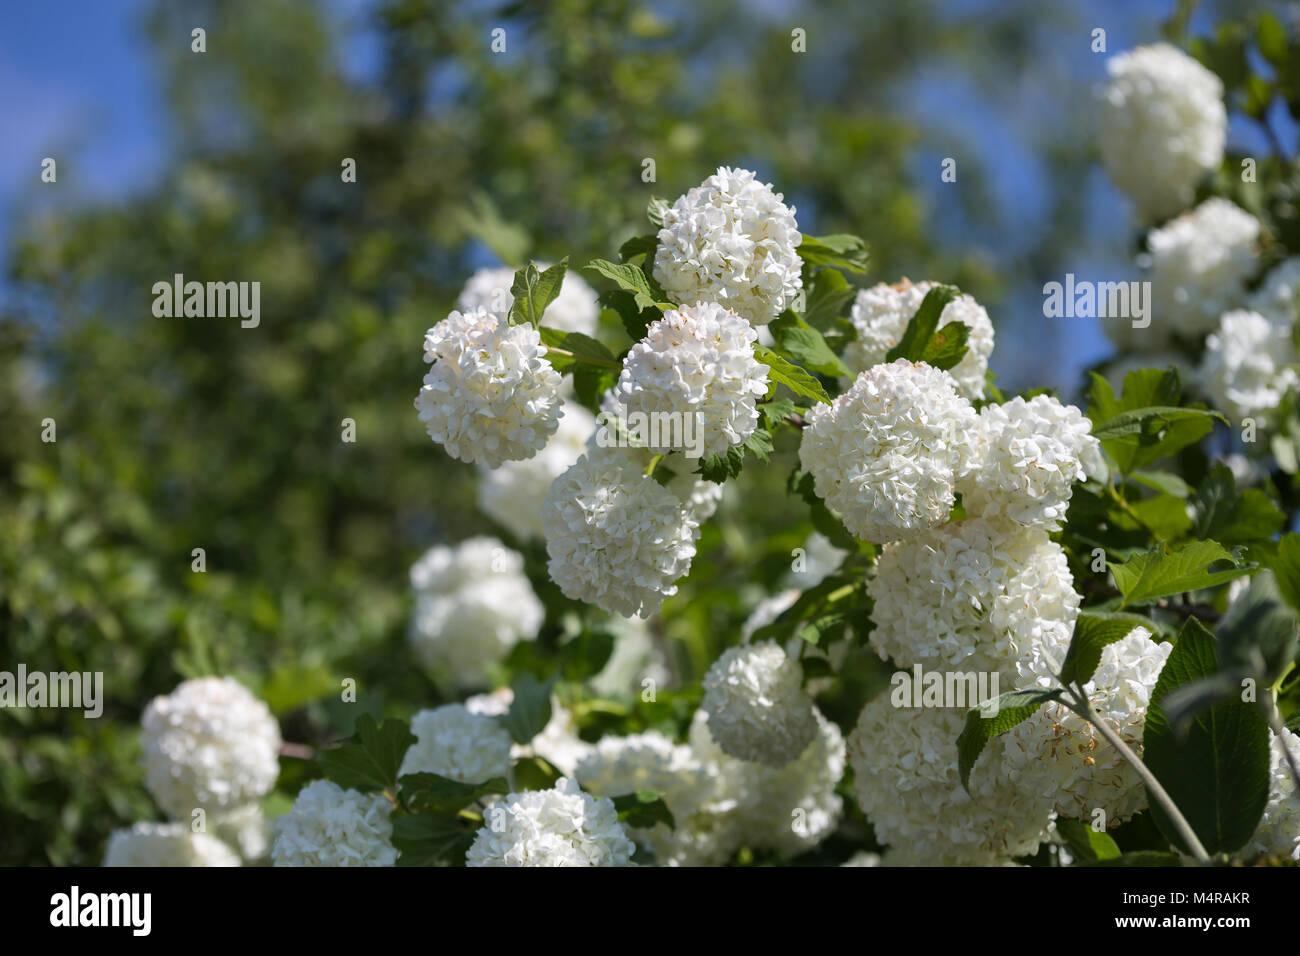 Ornamental Plant Snowball Viburnum White Flowers And Green Leaves